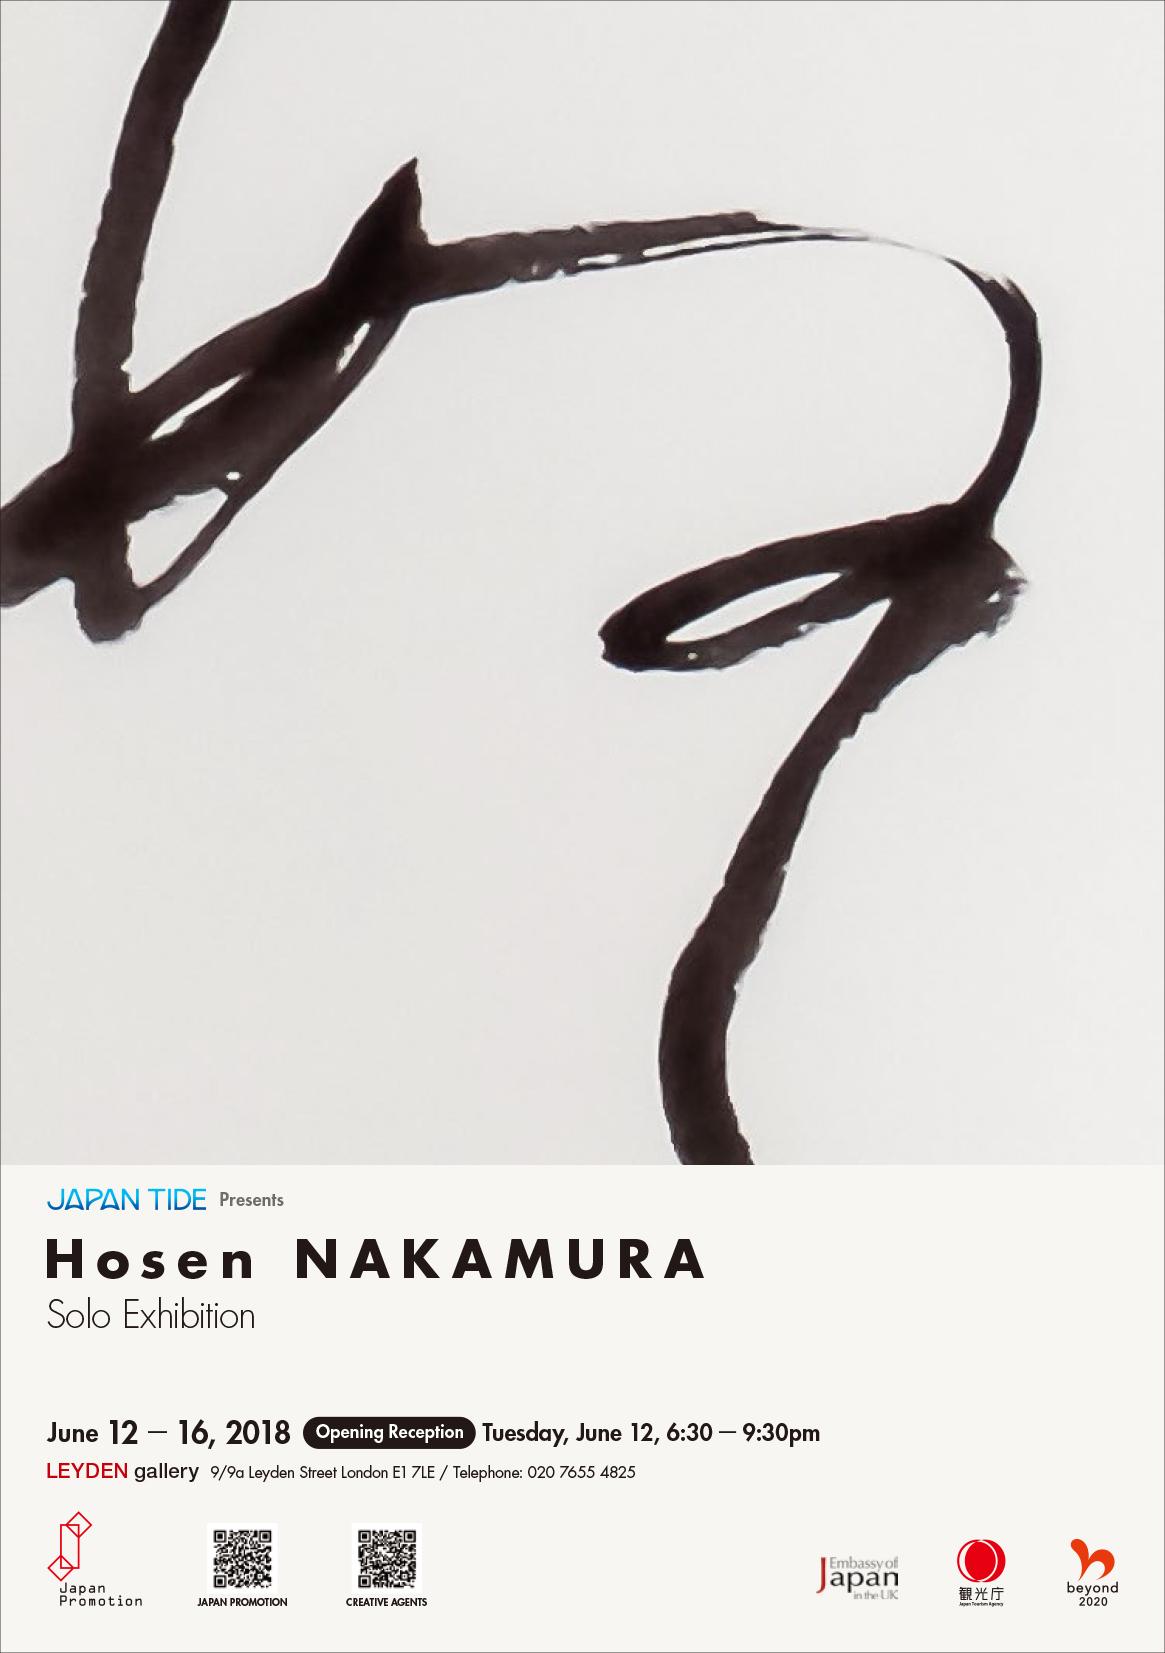 Housen Nakamura